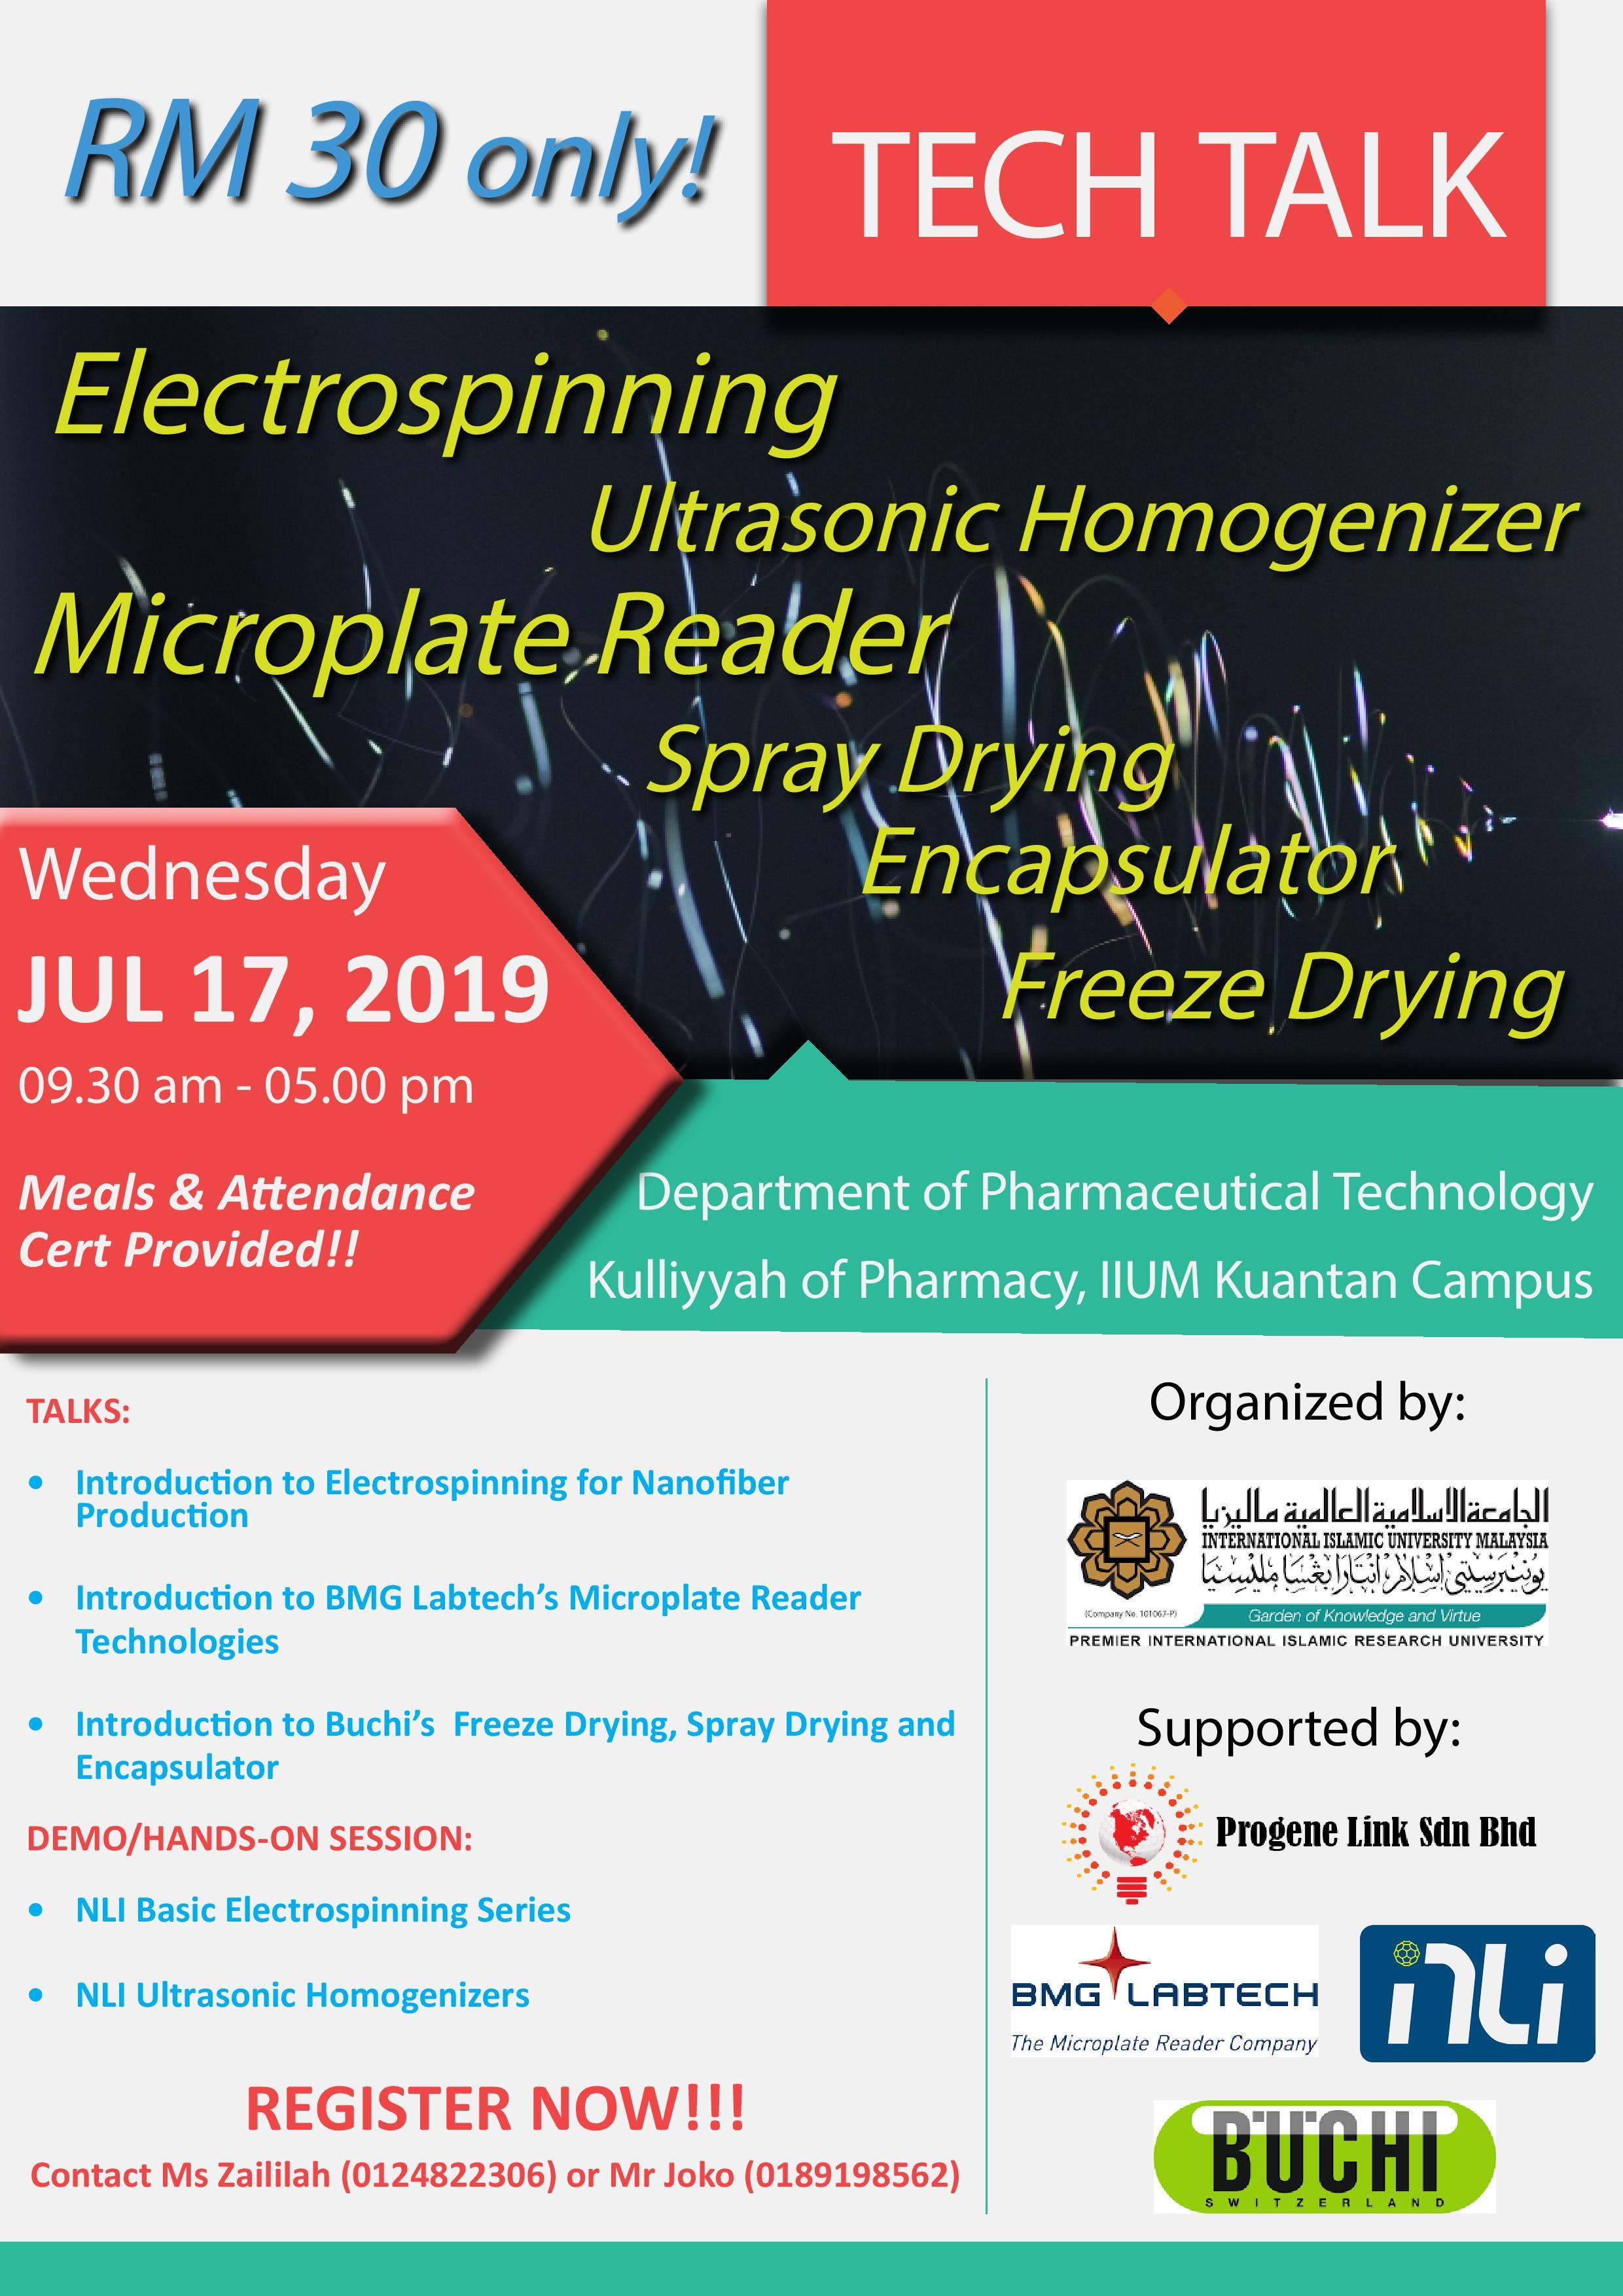 Tech Talk Day: Nanofiber, Nanoparticles and Microplate Assays